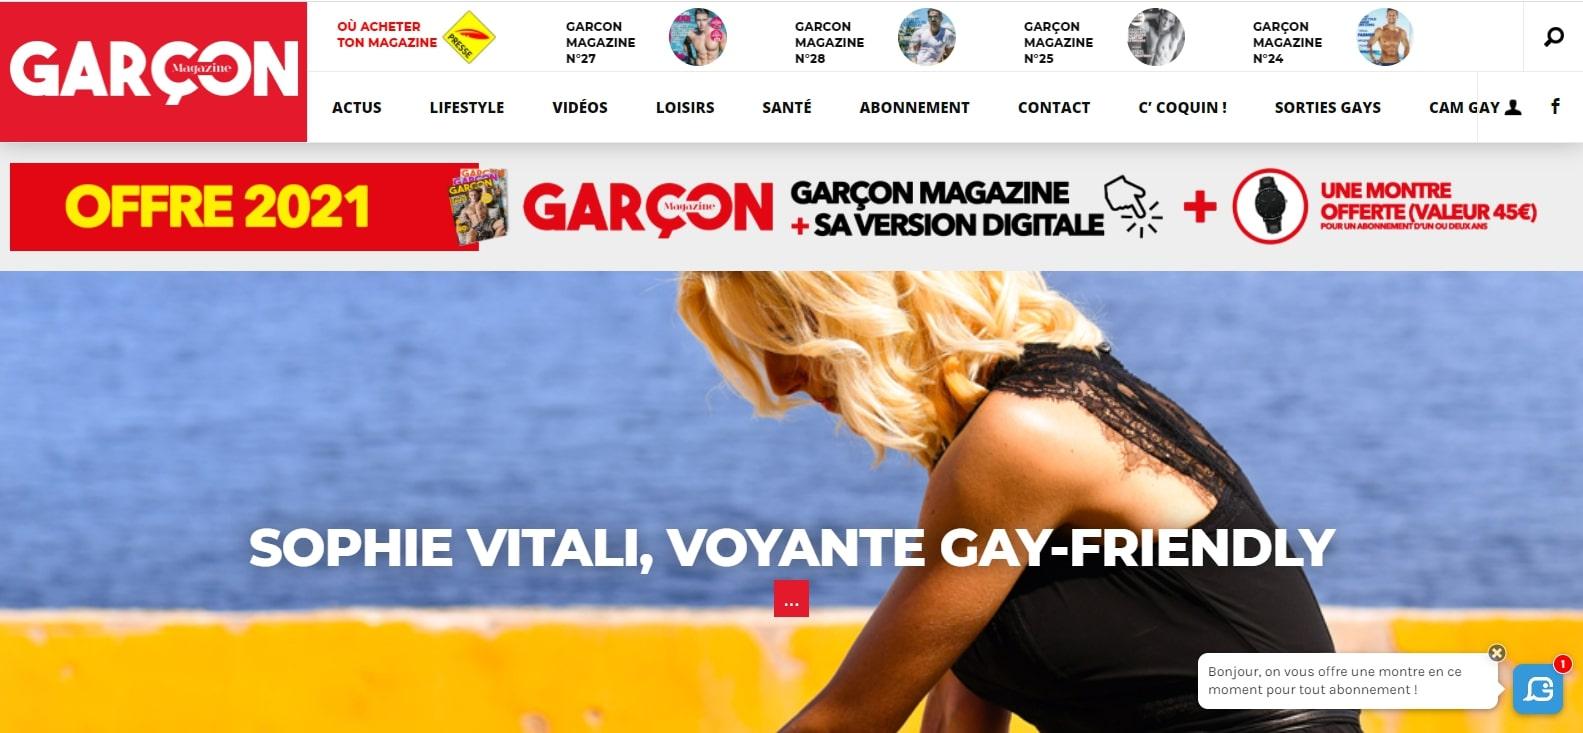 Sophie Vitali voyante gay-friendly en interview dans Garçon Magazine